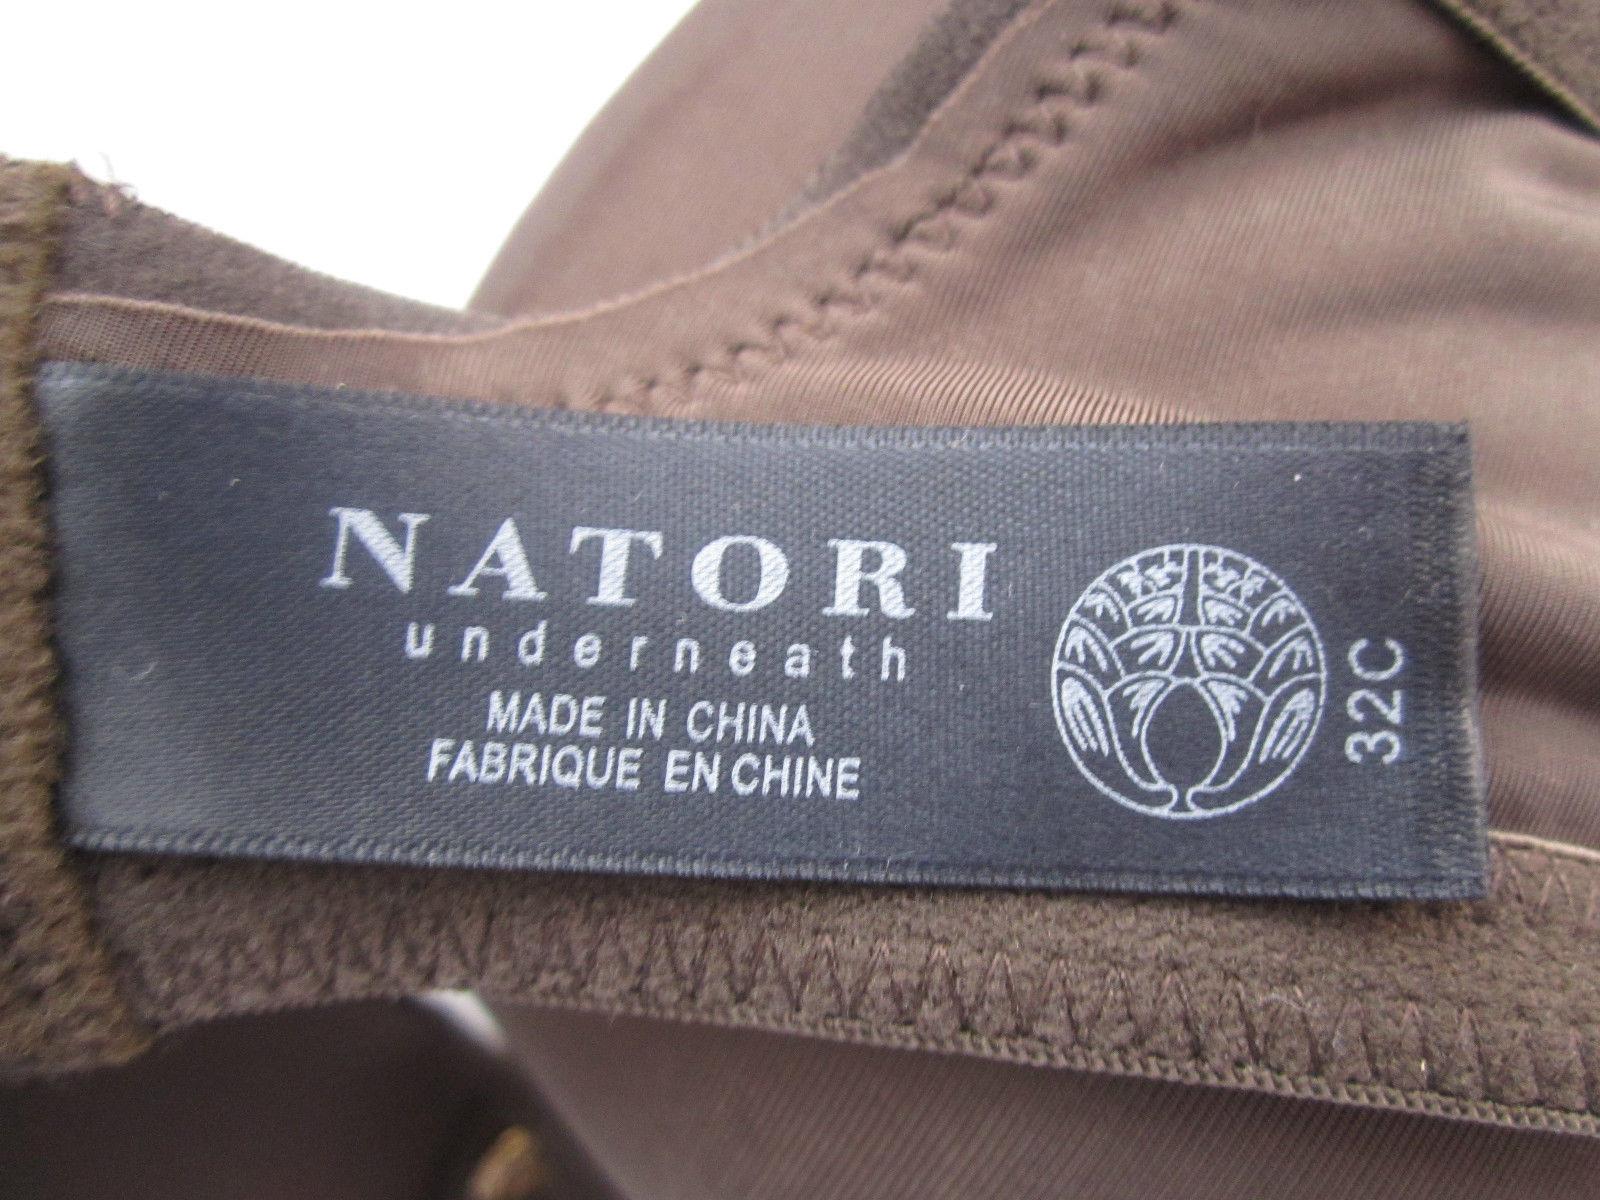 de891b0290 Natori 136001 Body Double Lace Trim FullFit Contour UW Bra Mahogany 32C  MSR 70